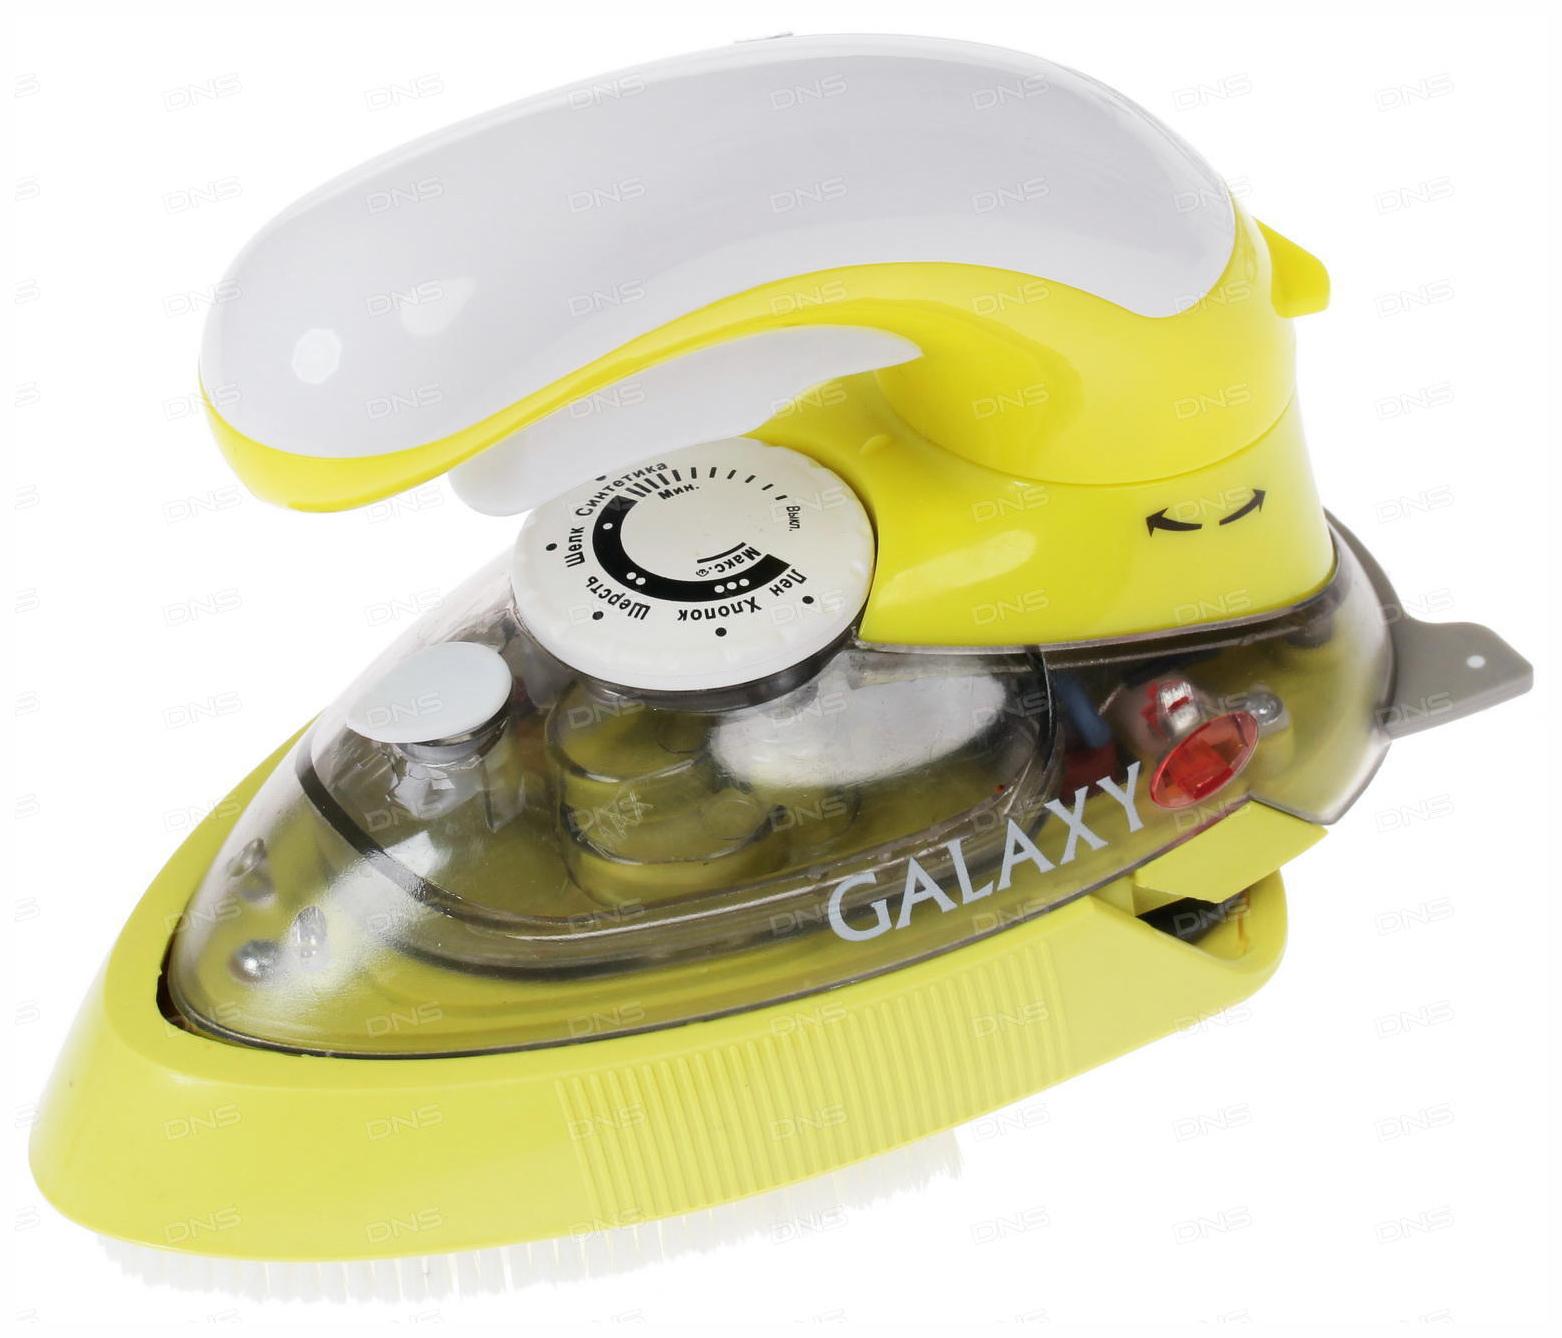 Пароочиститель Galaxy GL 6191 Желтый